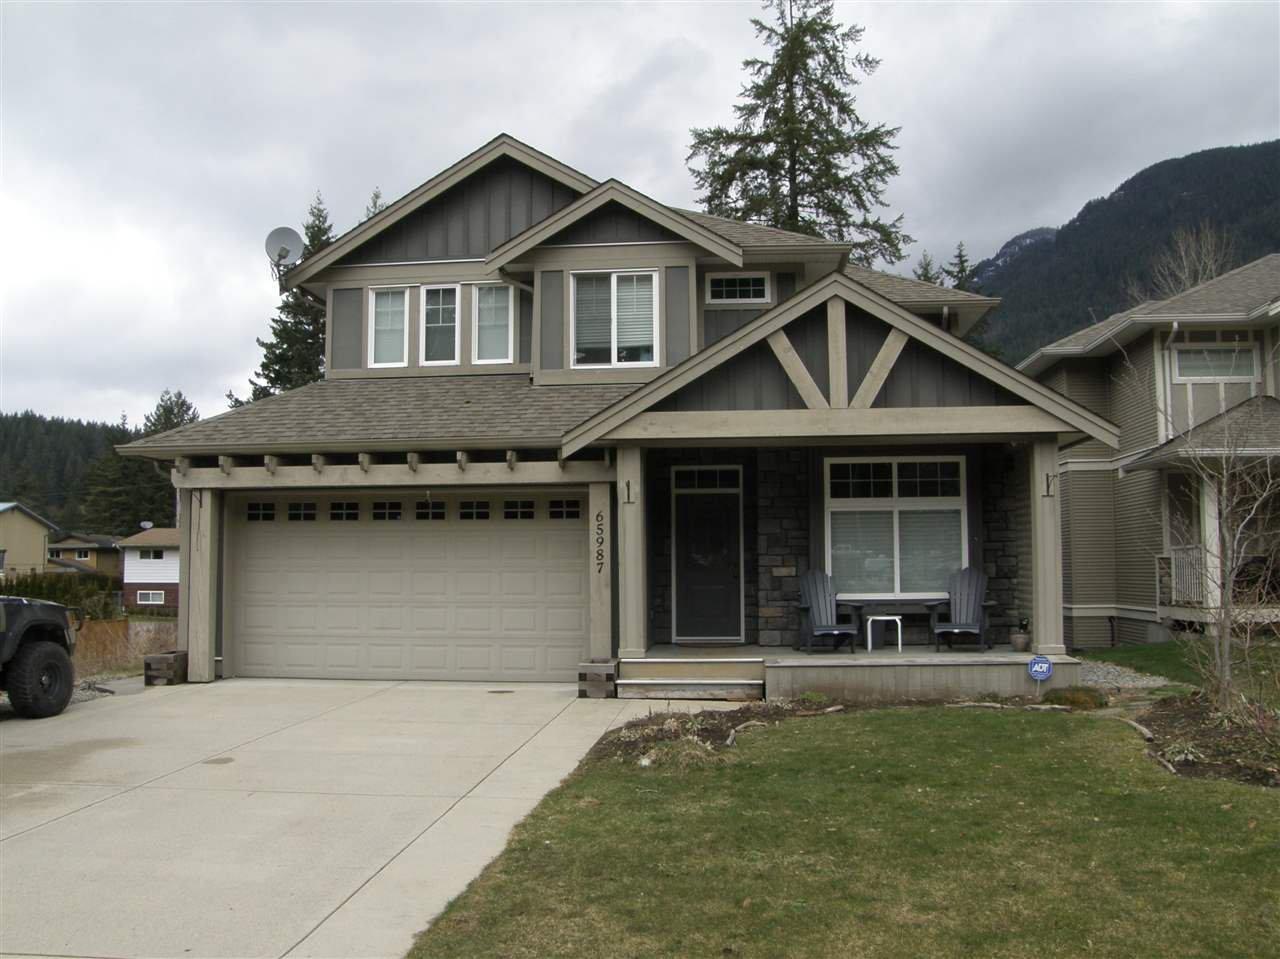 Main Photo: 65987 OGILVIEW Drive in Hope: Hope Kawkawa Lake House for sale : MLS®# R2443897